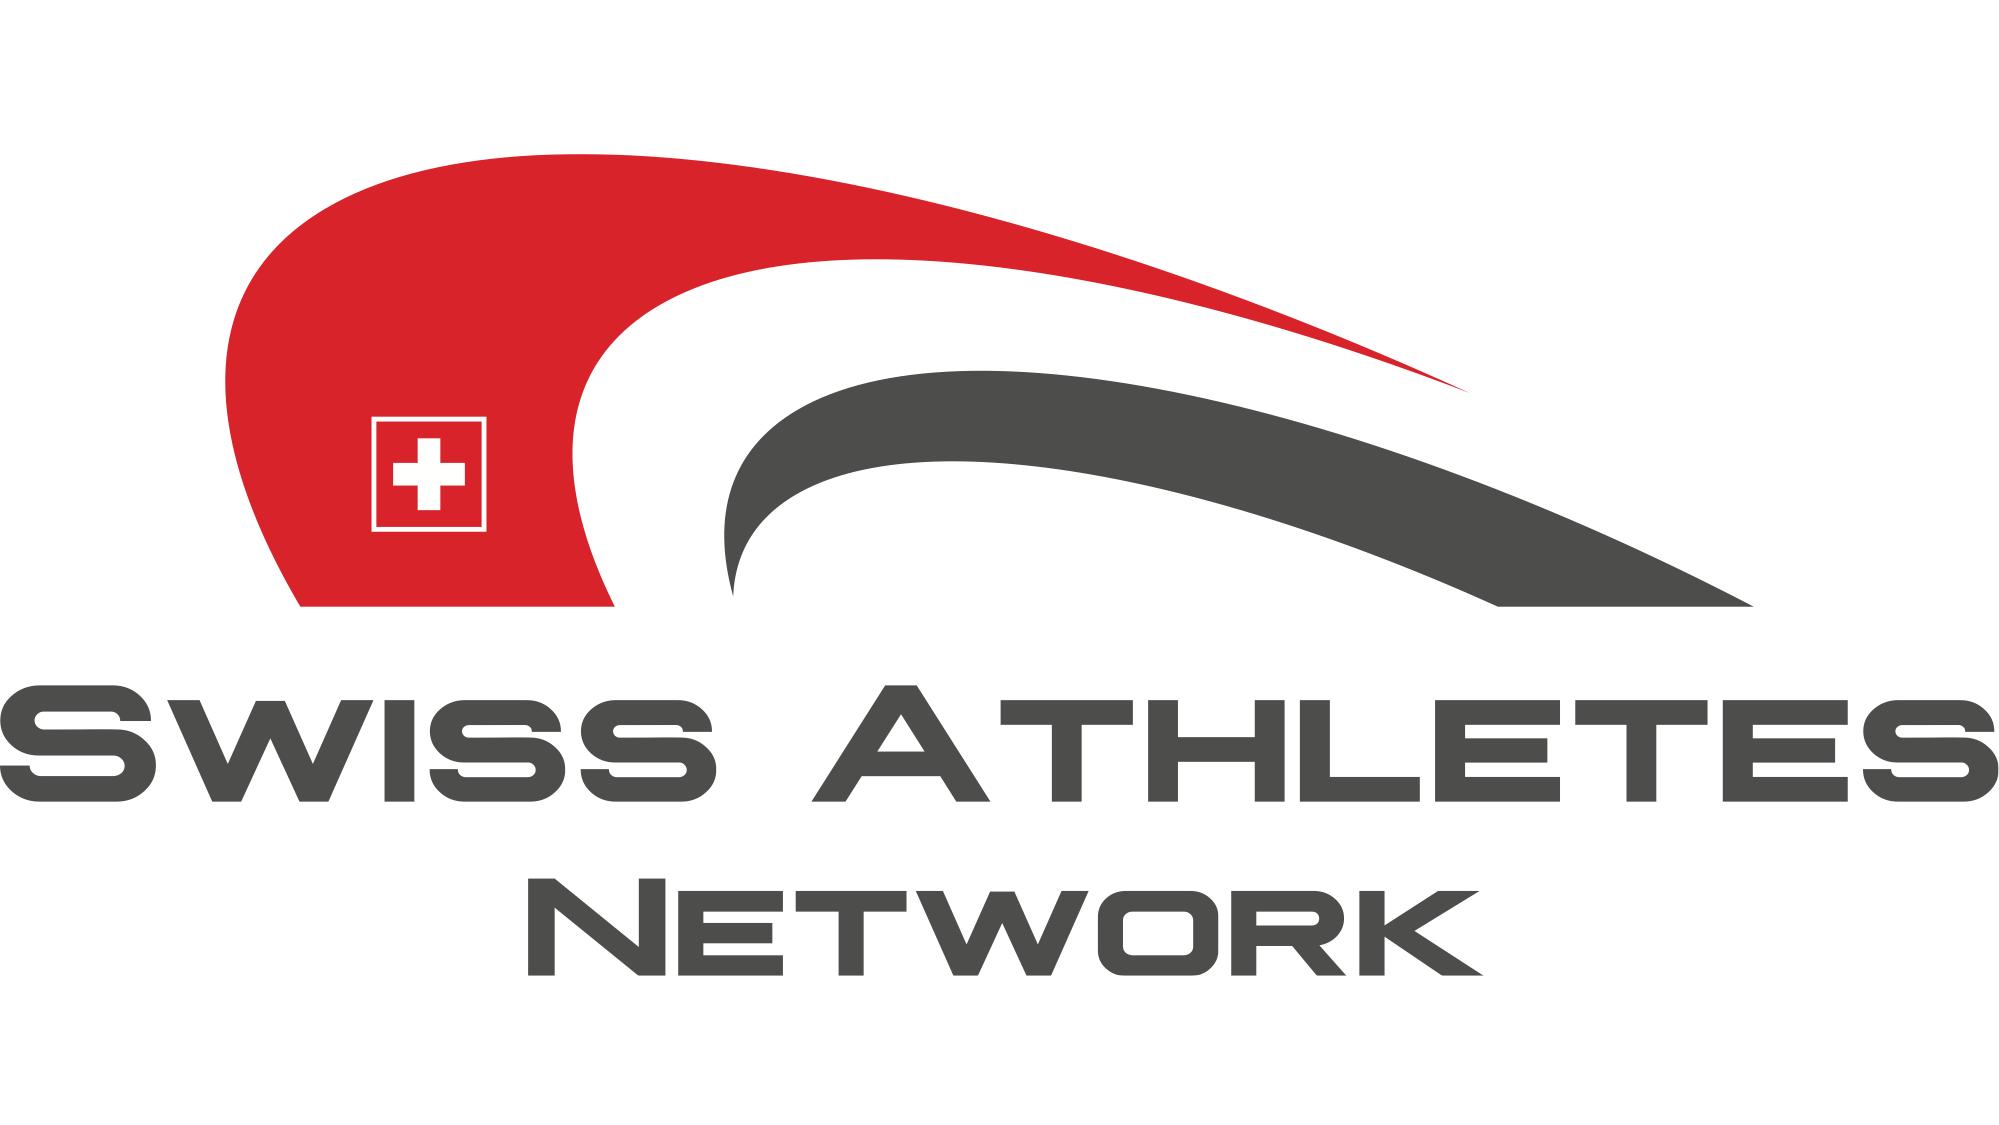 Swiss Athletes Network